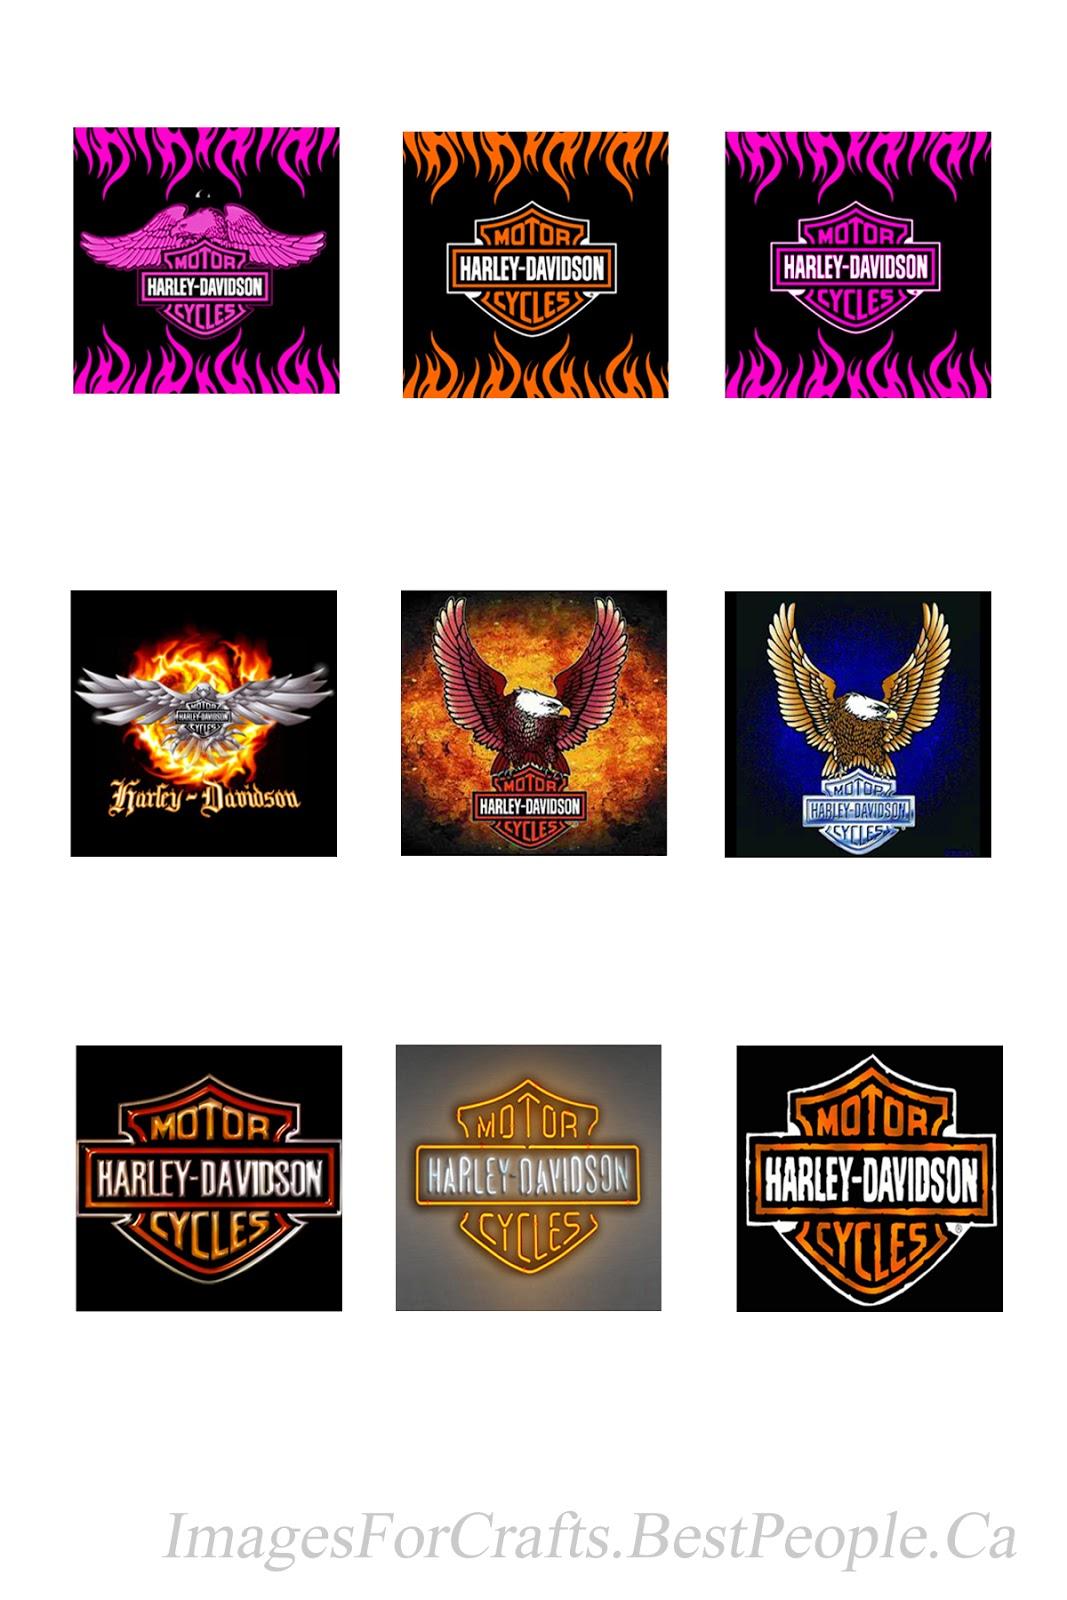 image relating to Printable Harley Davidson Logo called Cost-free photos of Harley Davidson Trademarks. Down load and Print